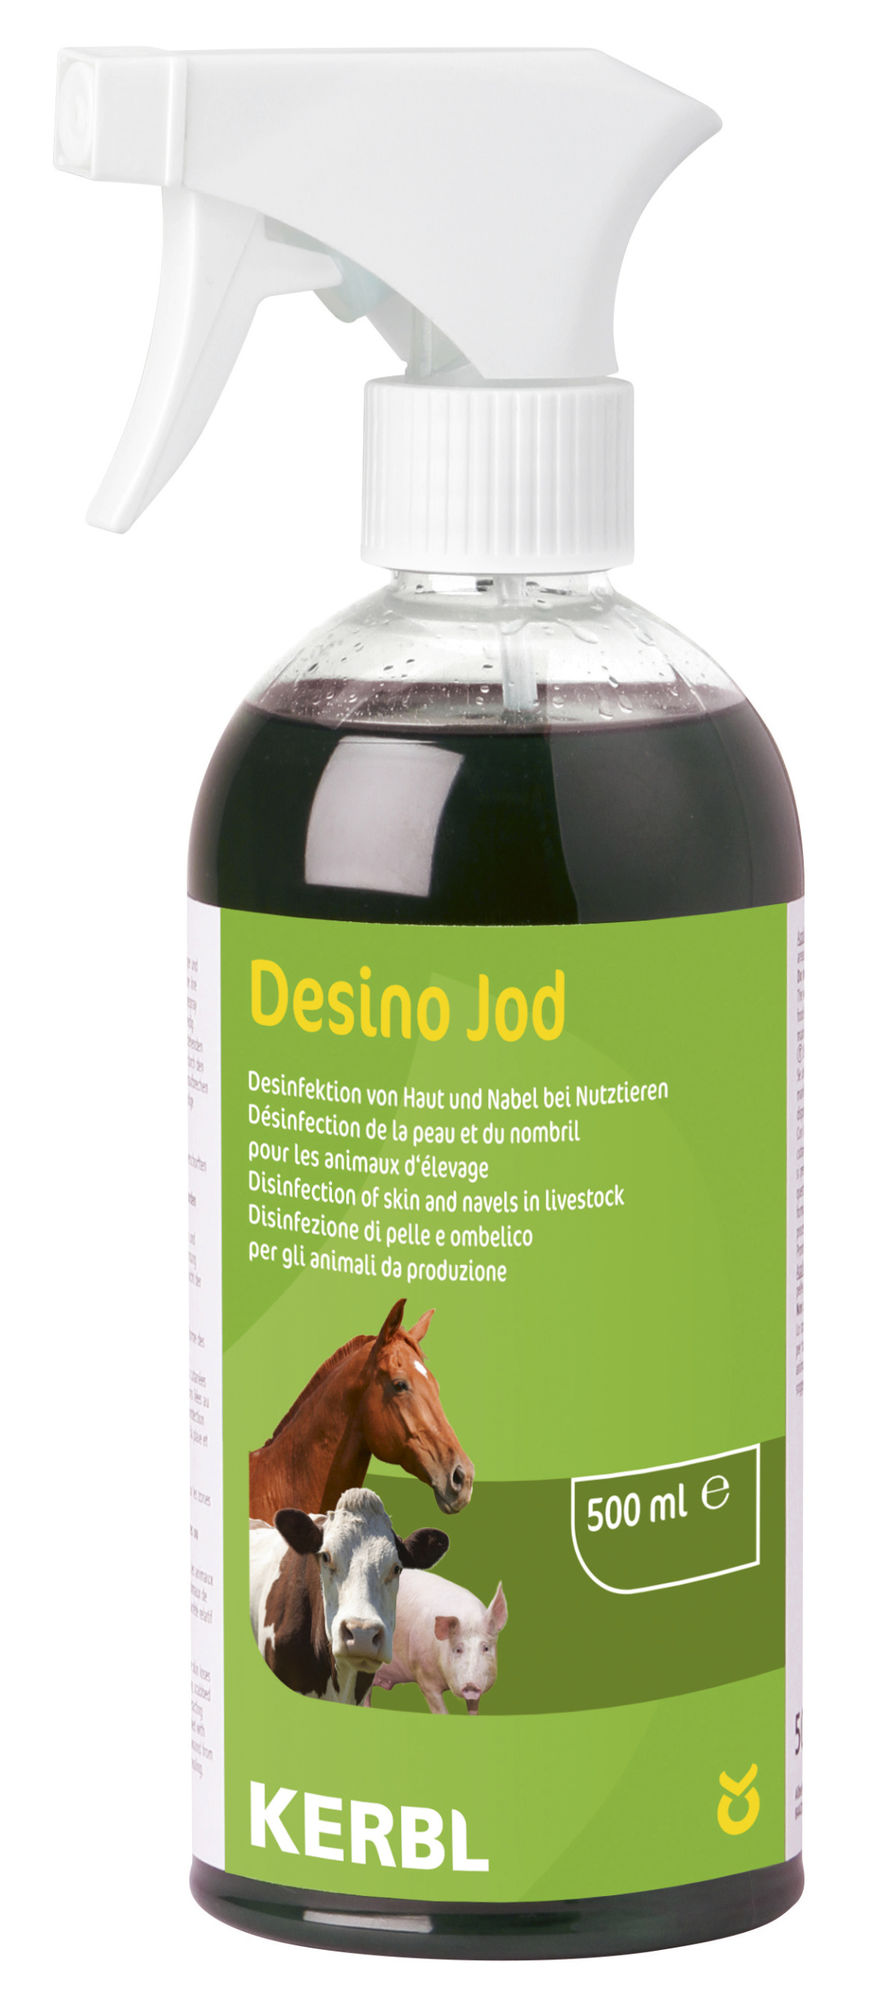 Desino Jod, Desinfektionsspray 500ml